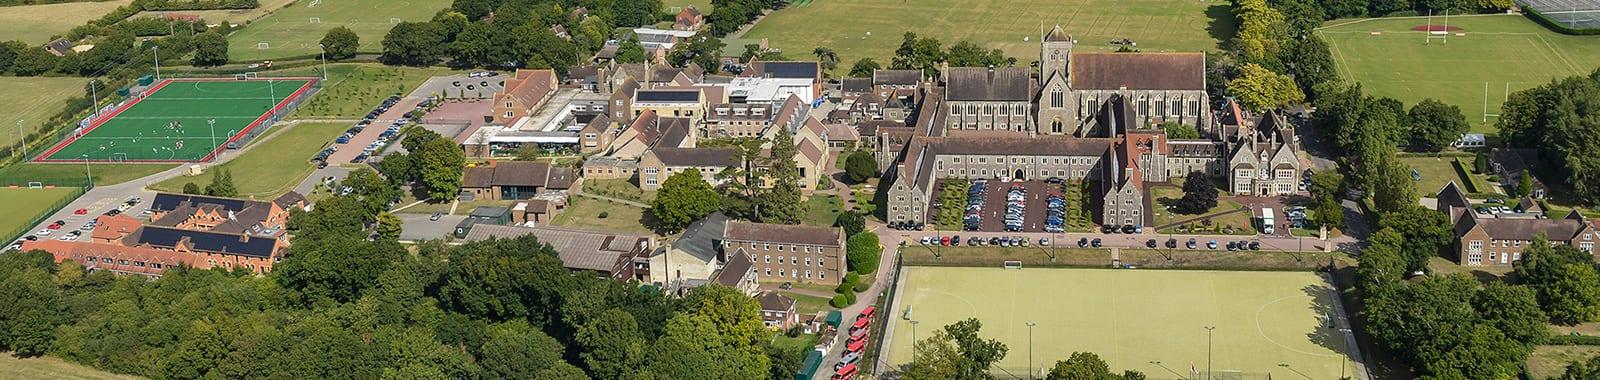 Manor Courses – International Summer School